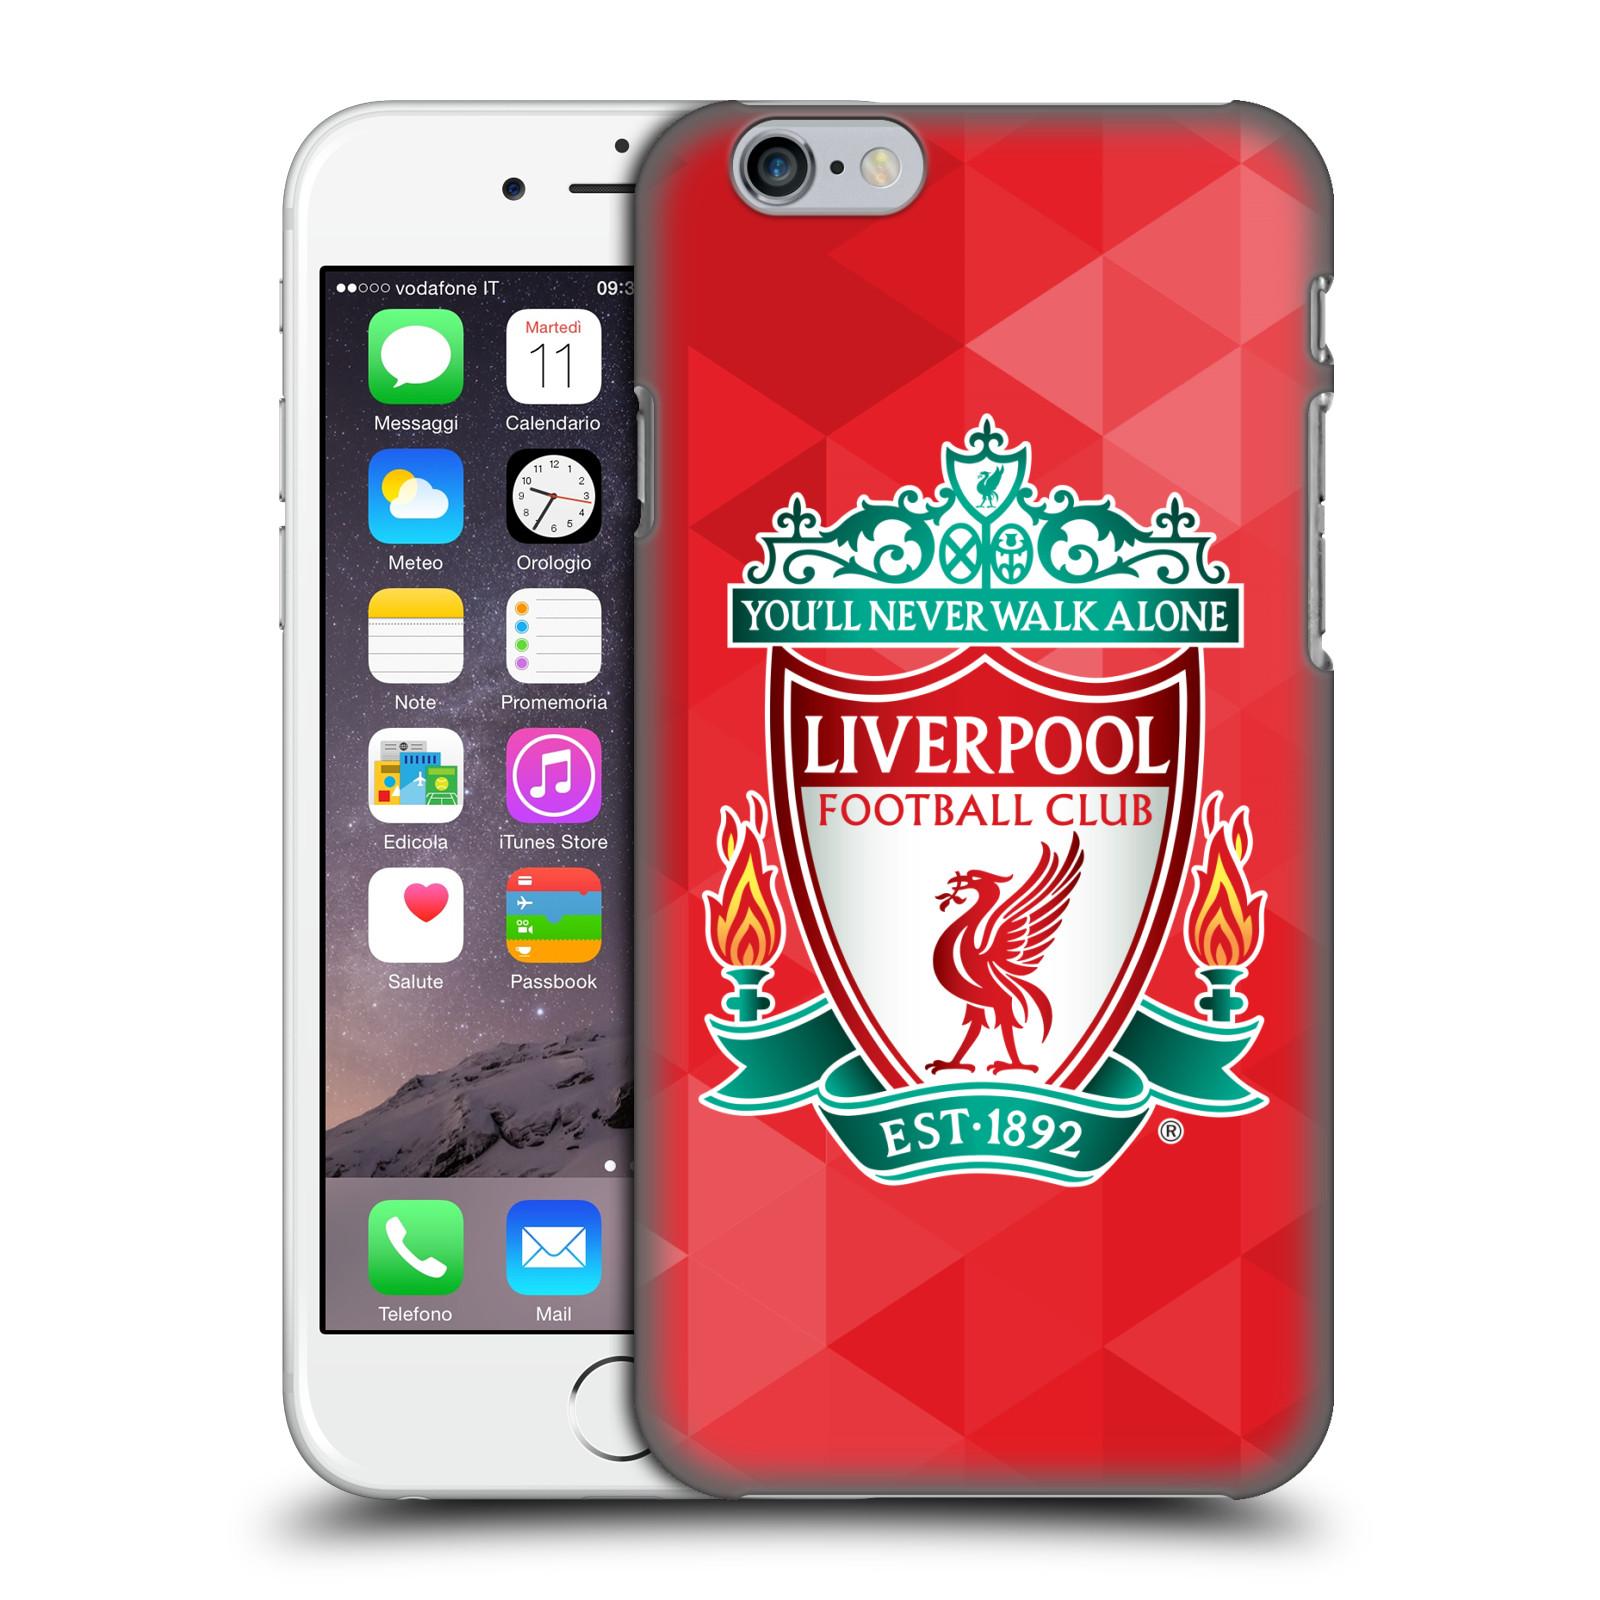 Plastové pouzdro na mobil Apple iPhone 6 HEAD CASE ZNAK LIVERPOOL FC OFFICIAL GEOMETRIC RED